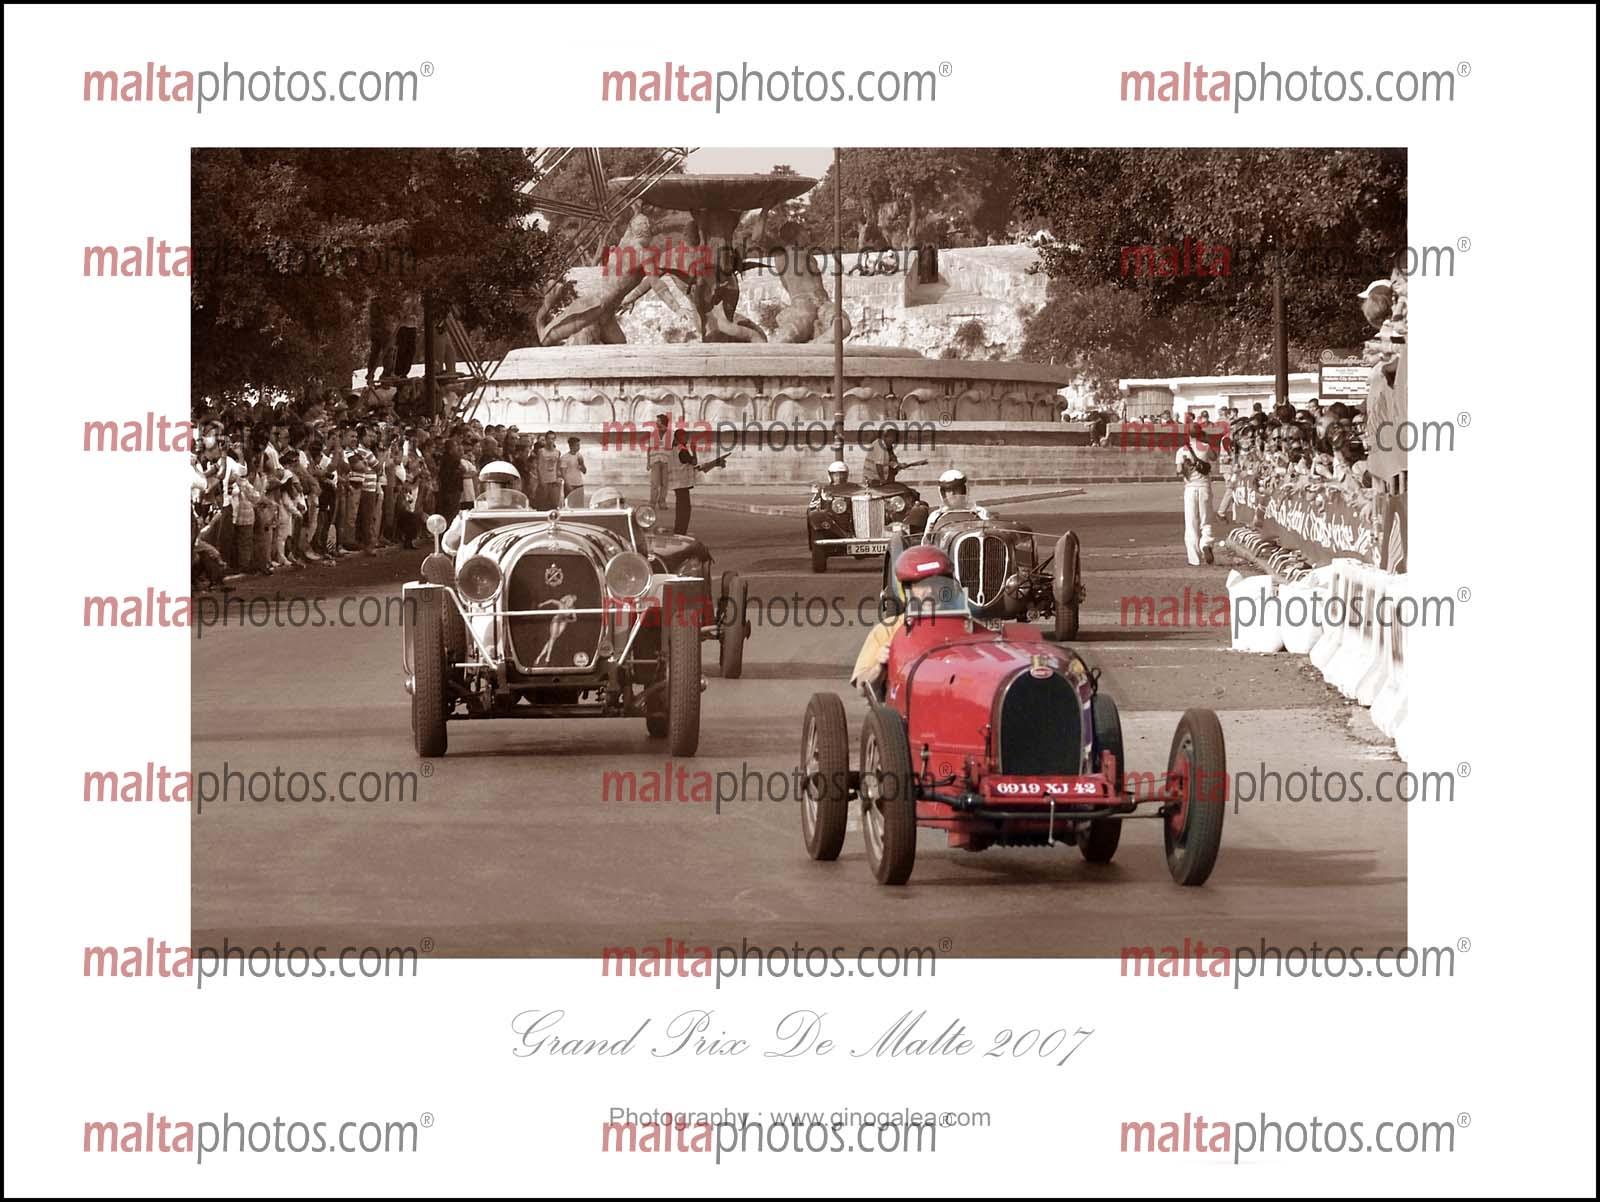 Vehicles Vintage Old Classic Cars Gran Prix - Malta Photos